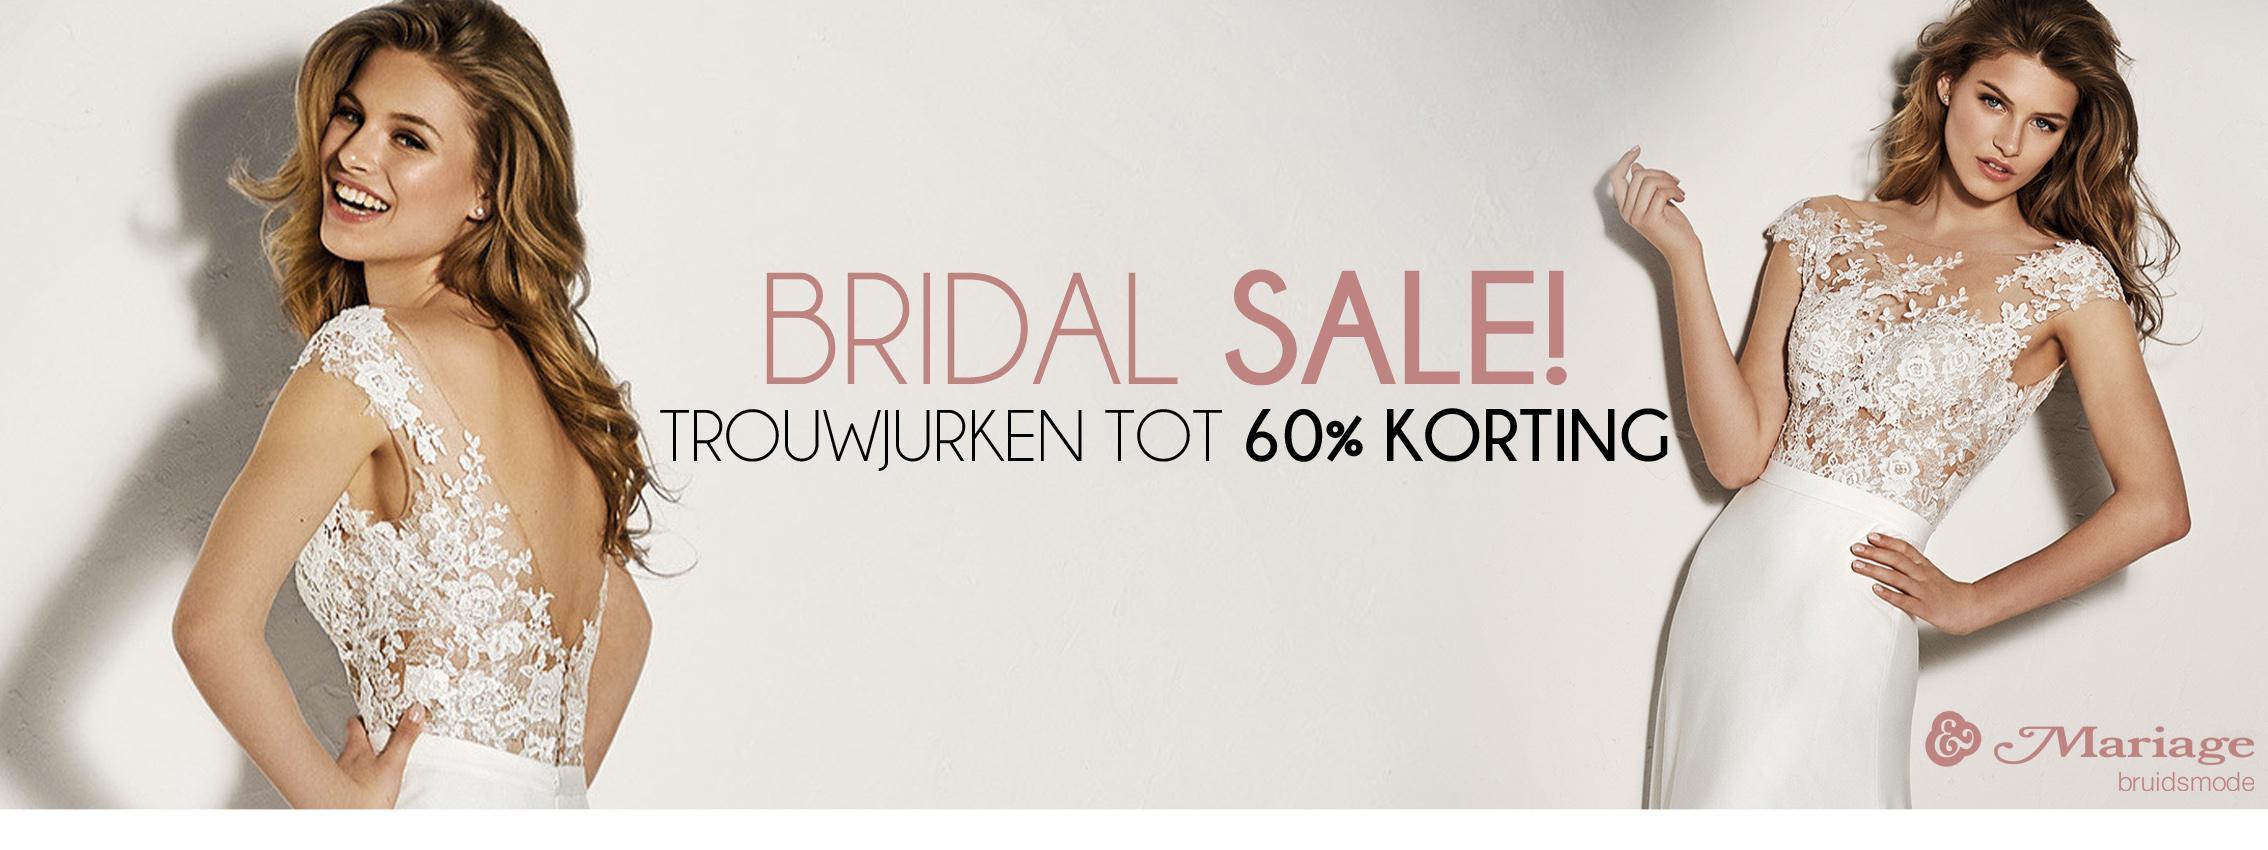 Bridal sale! - trouwjurken tot 60% korting!